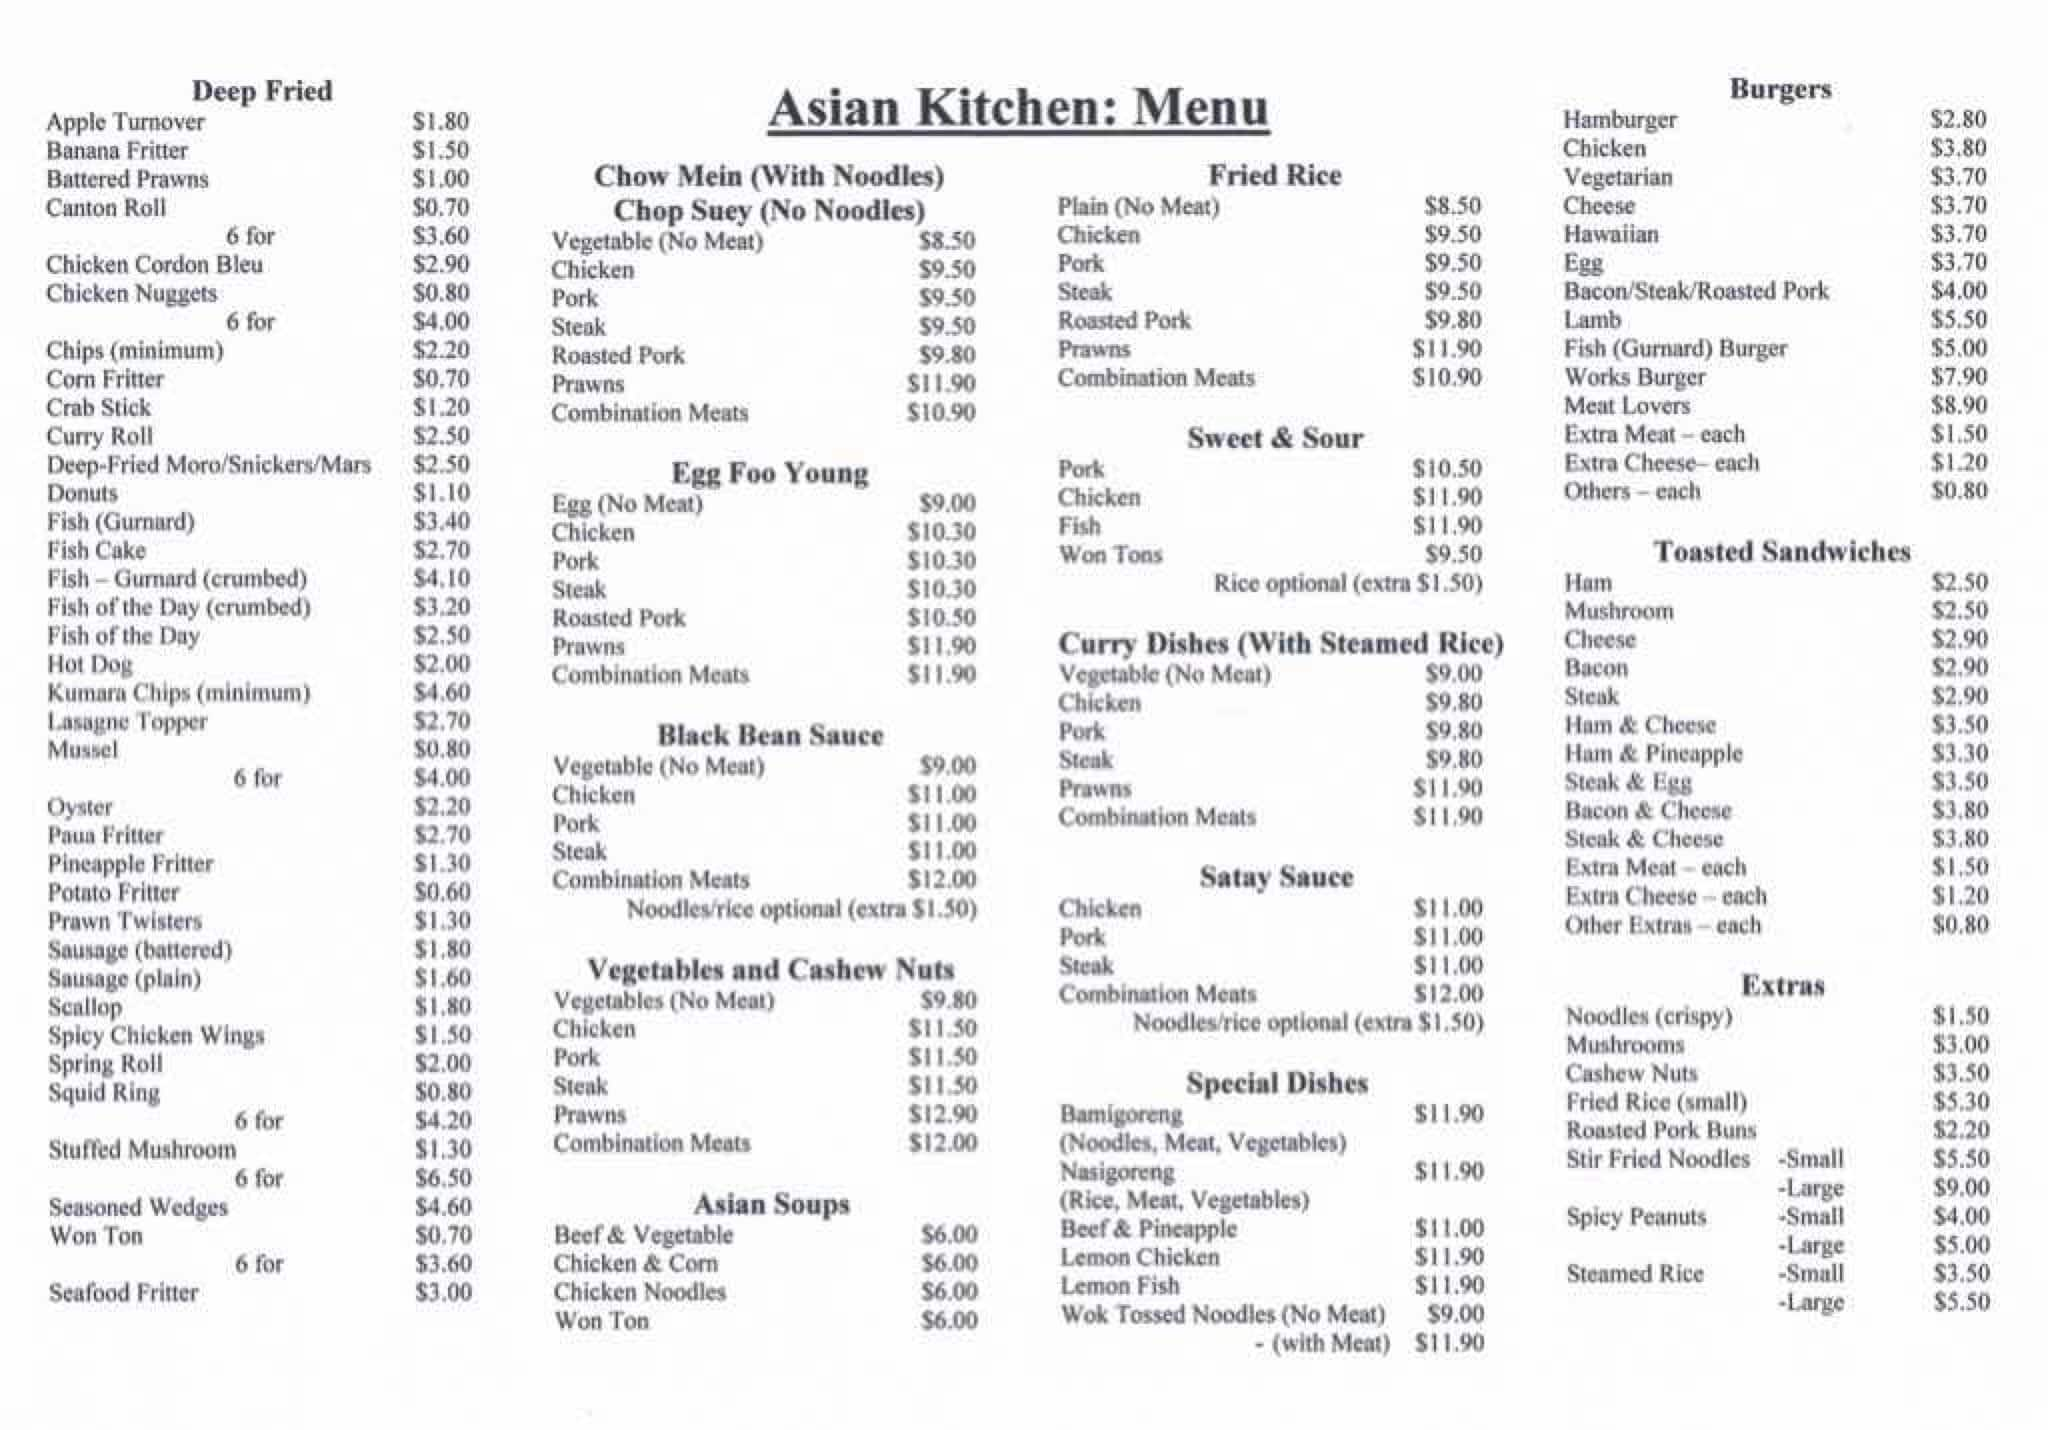 Asian Kitchen Menu, Menu for Asian Kitchen, Forest Lake, Hamilton ...